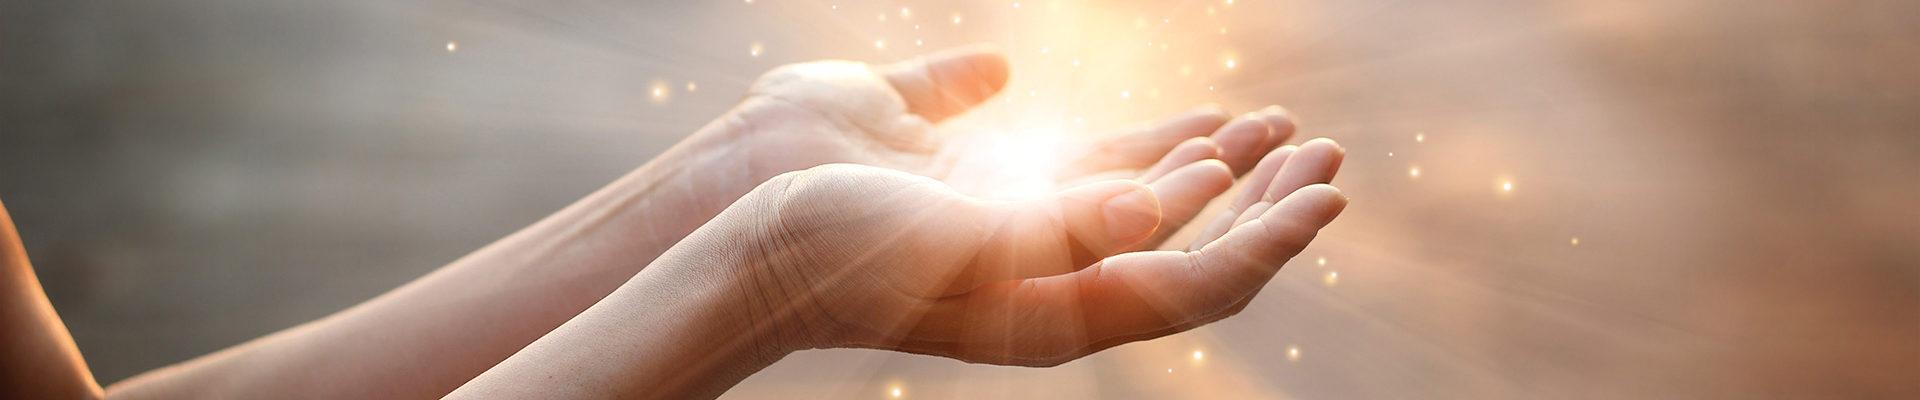 Фонд Инна - Молитвы